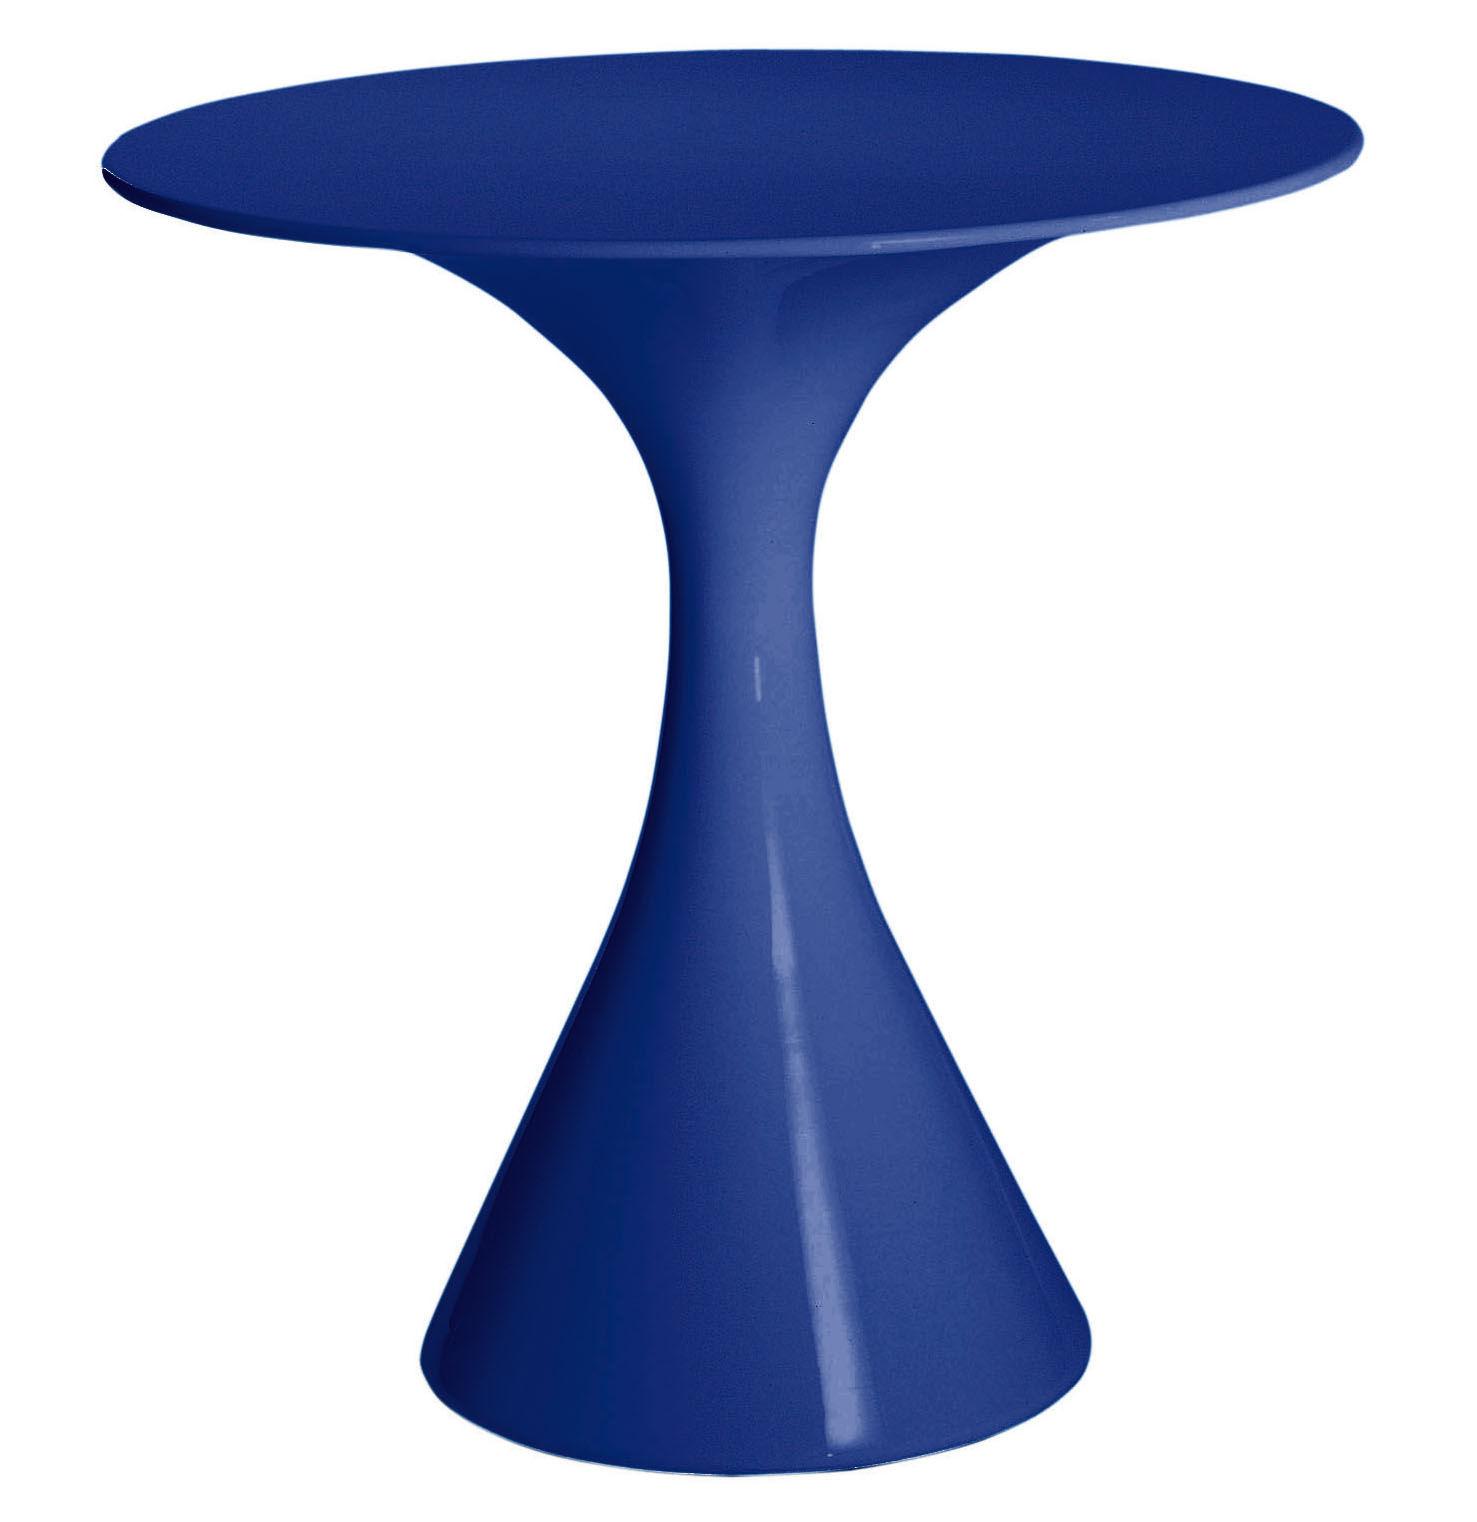 Table de jardin kissi kissi bleu driade for Table jardin bleu